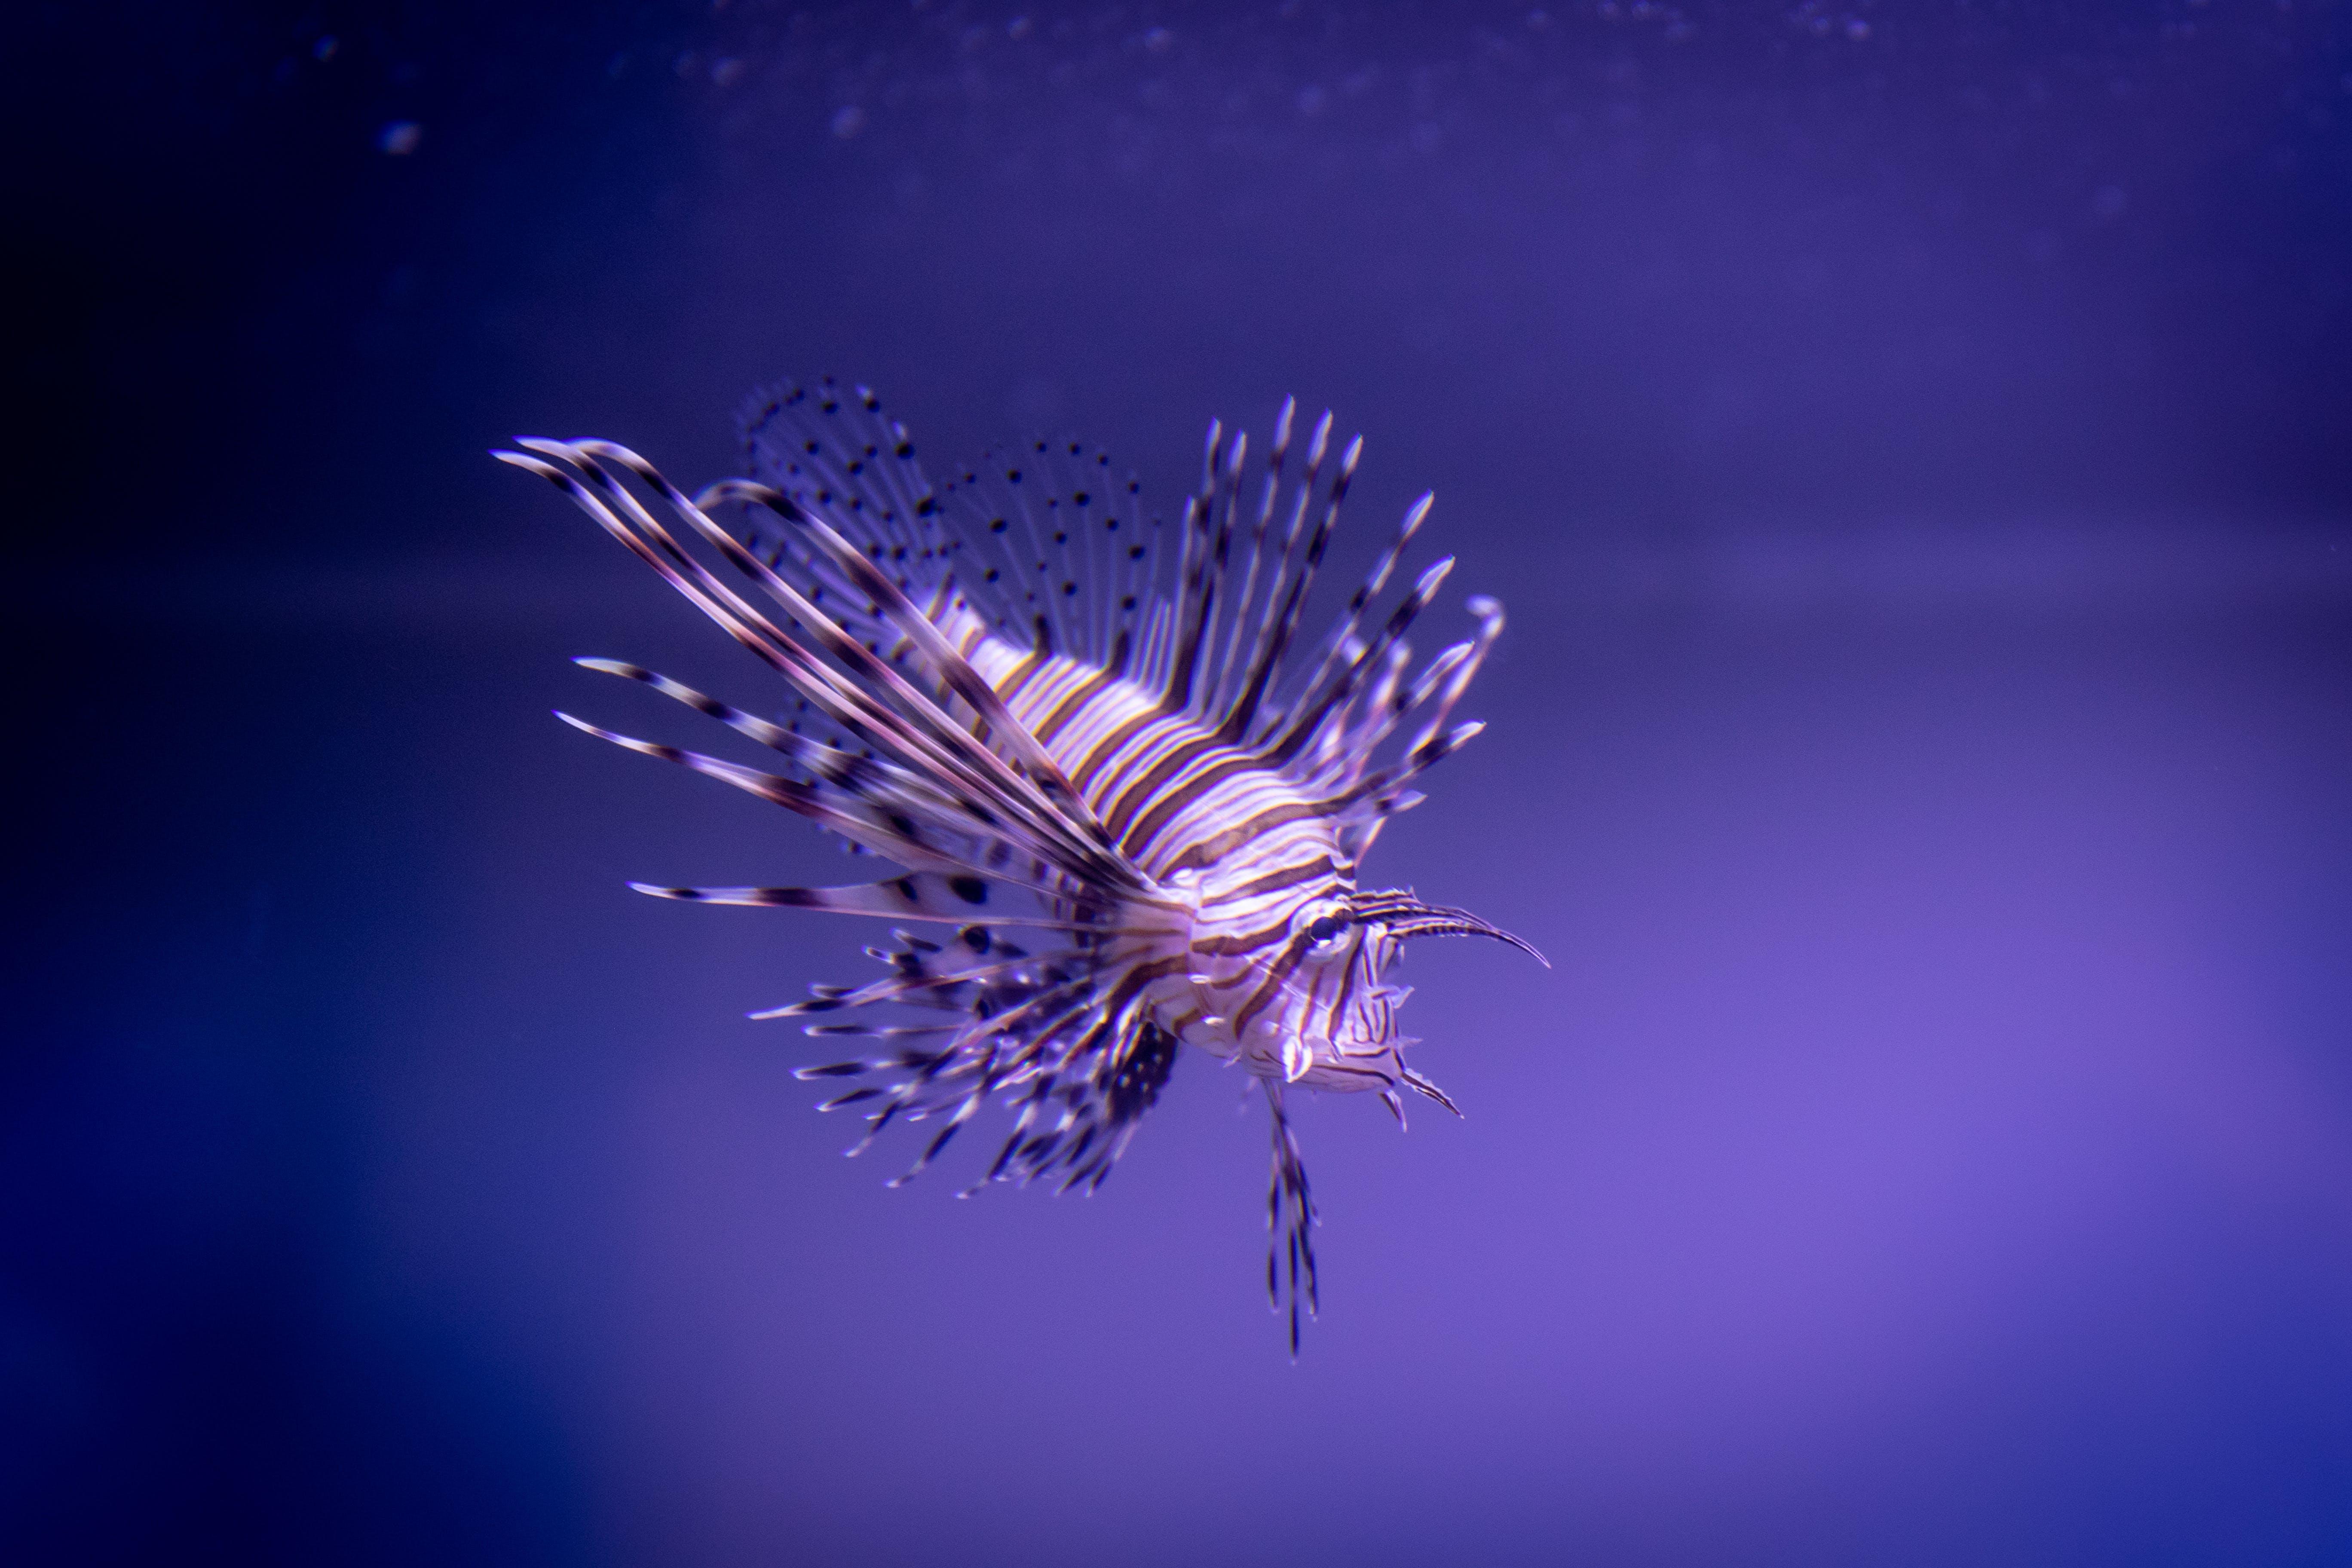 animal, aquatic animal, biology